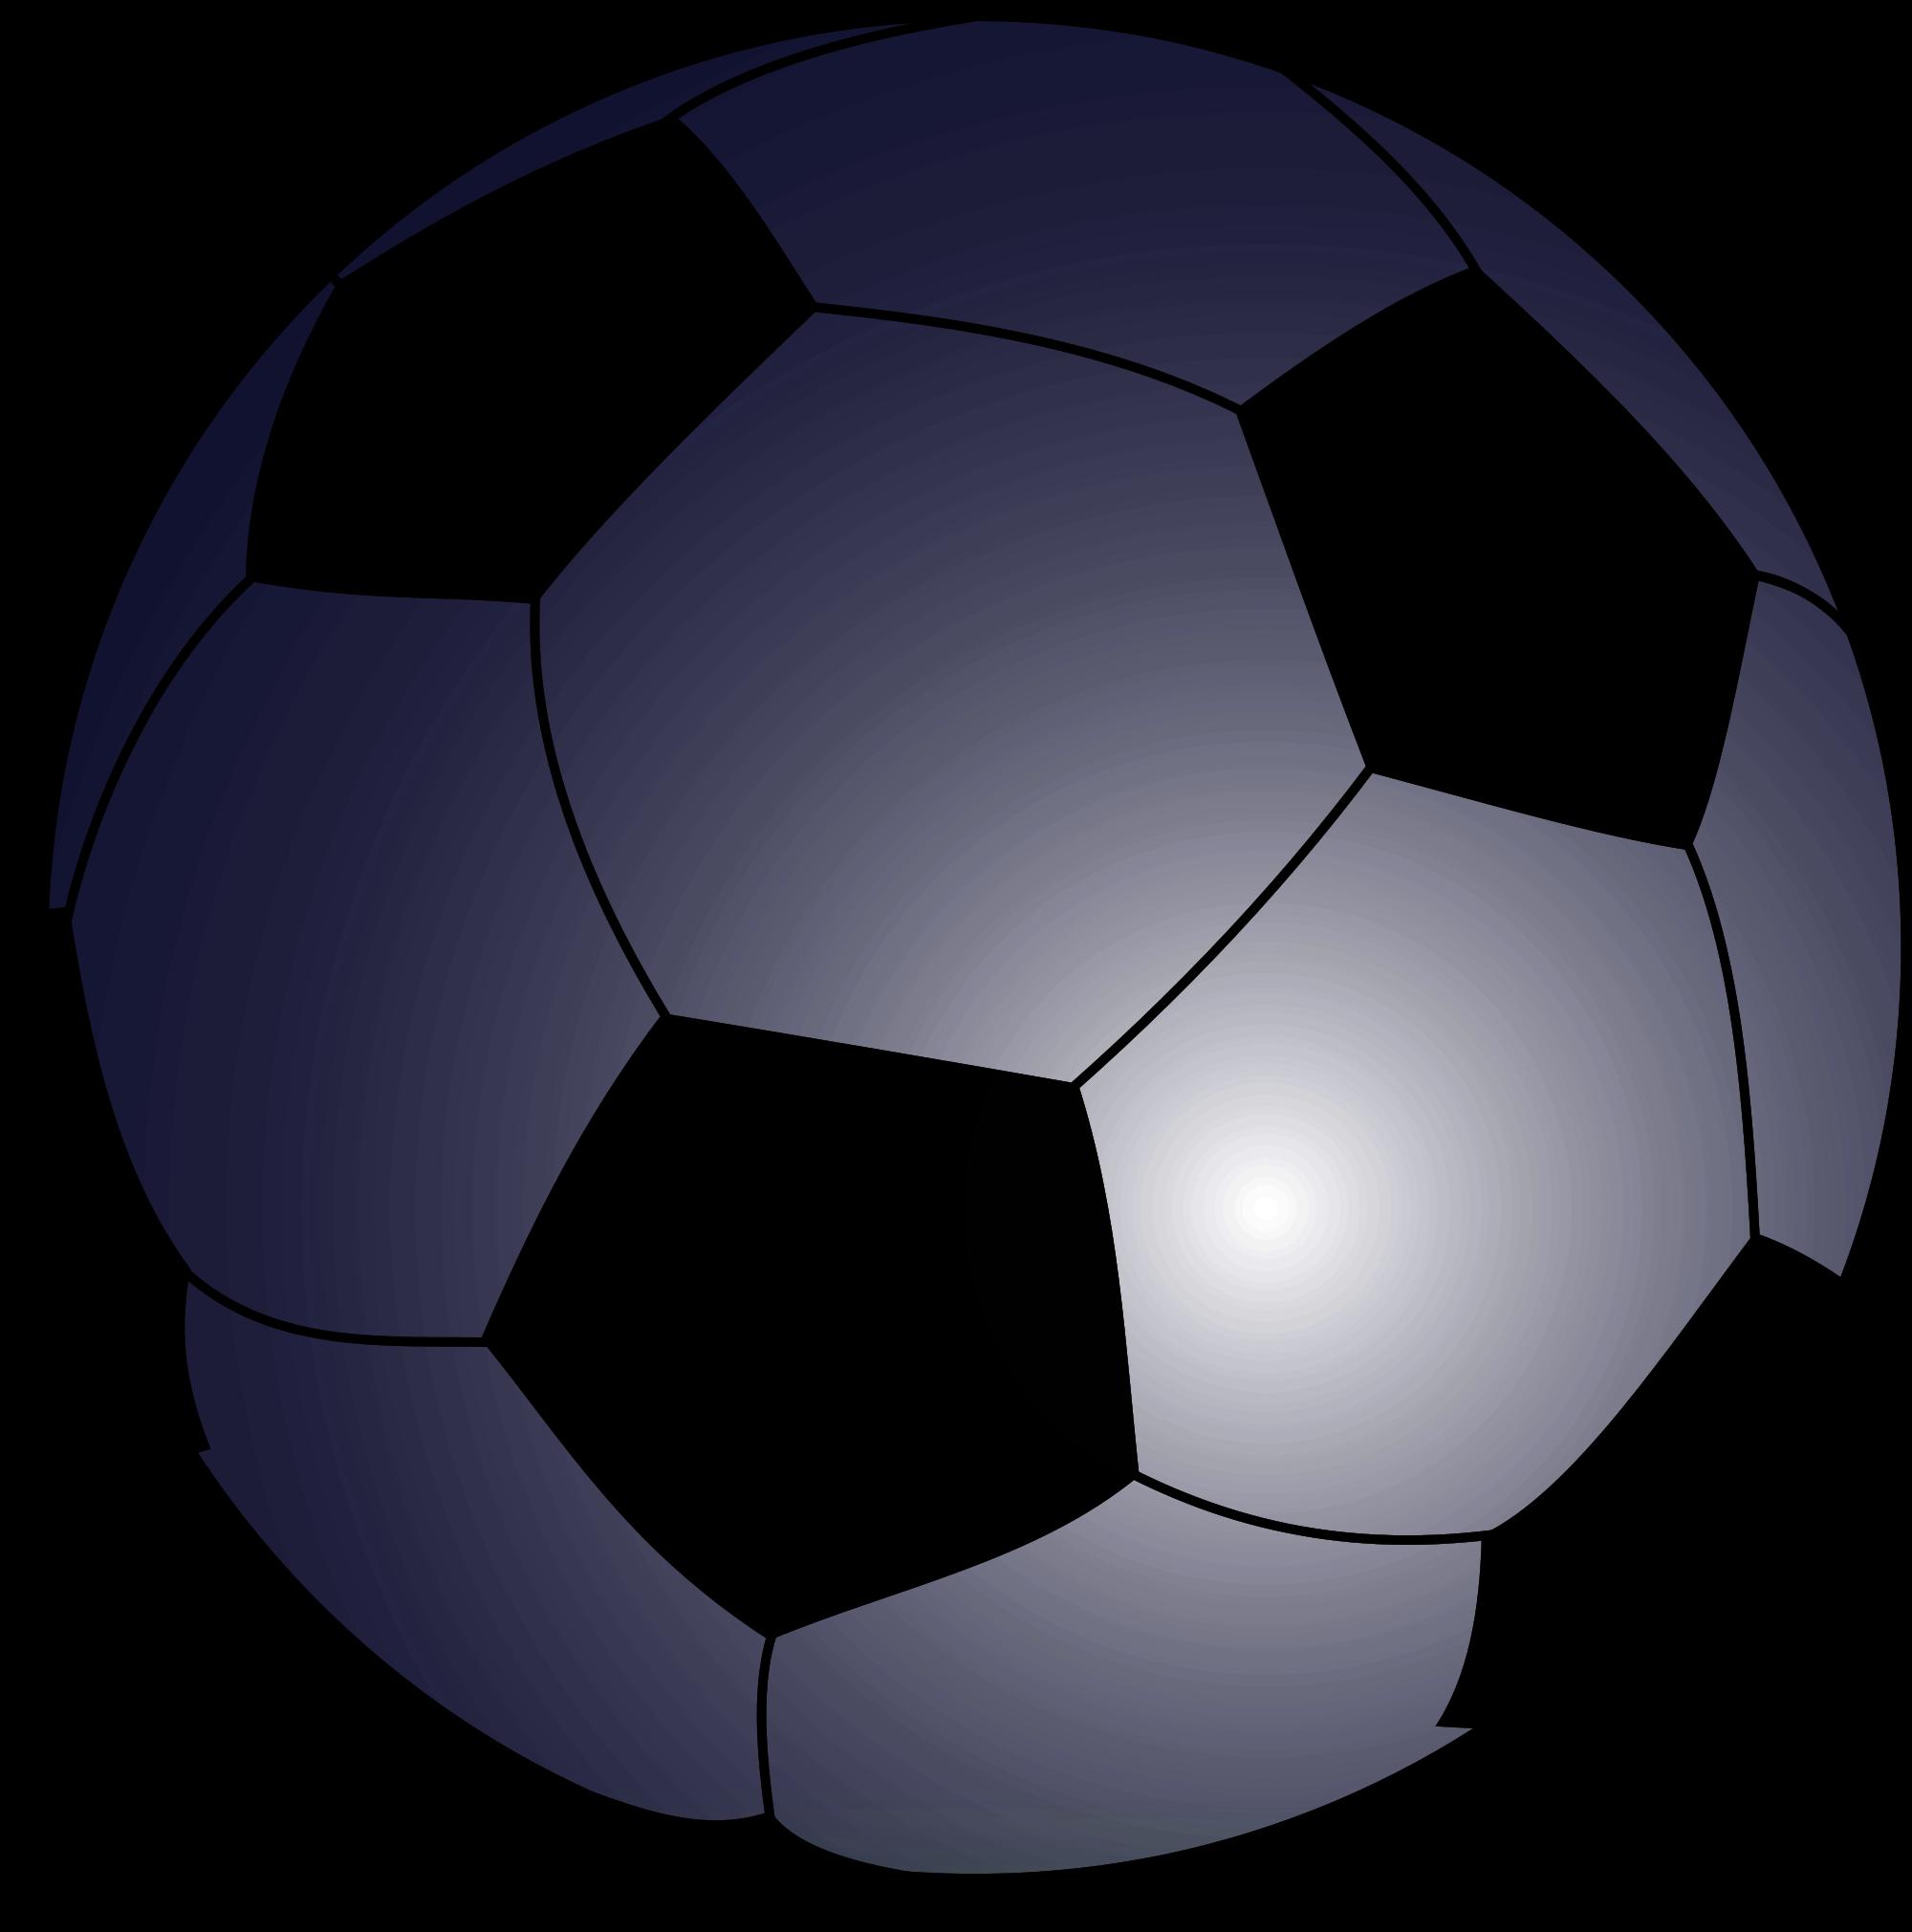 clip Ball transparent background. File soccerball mask svg